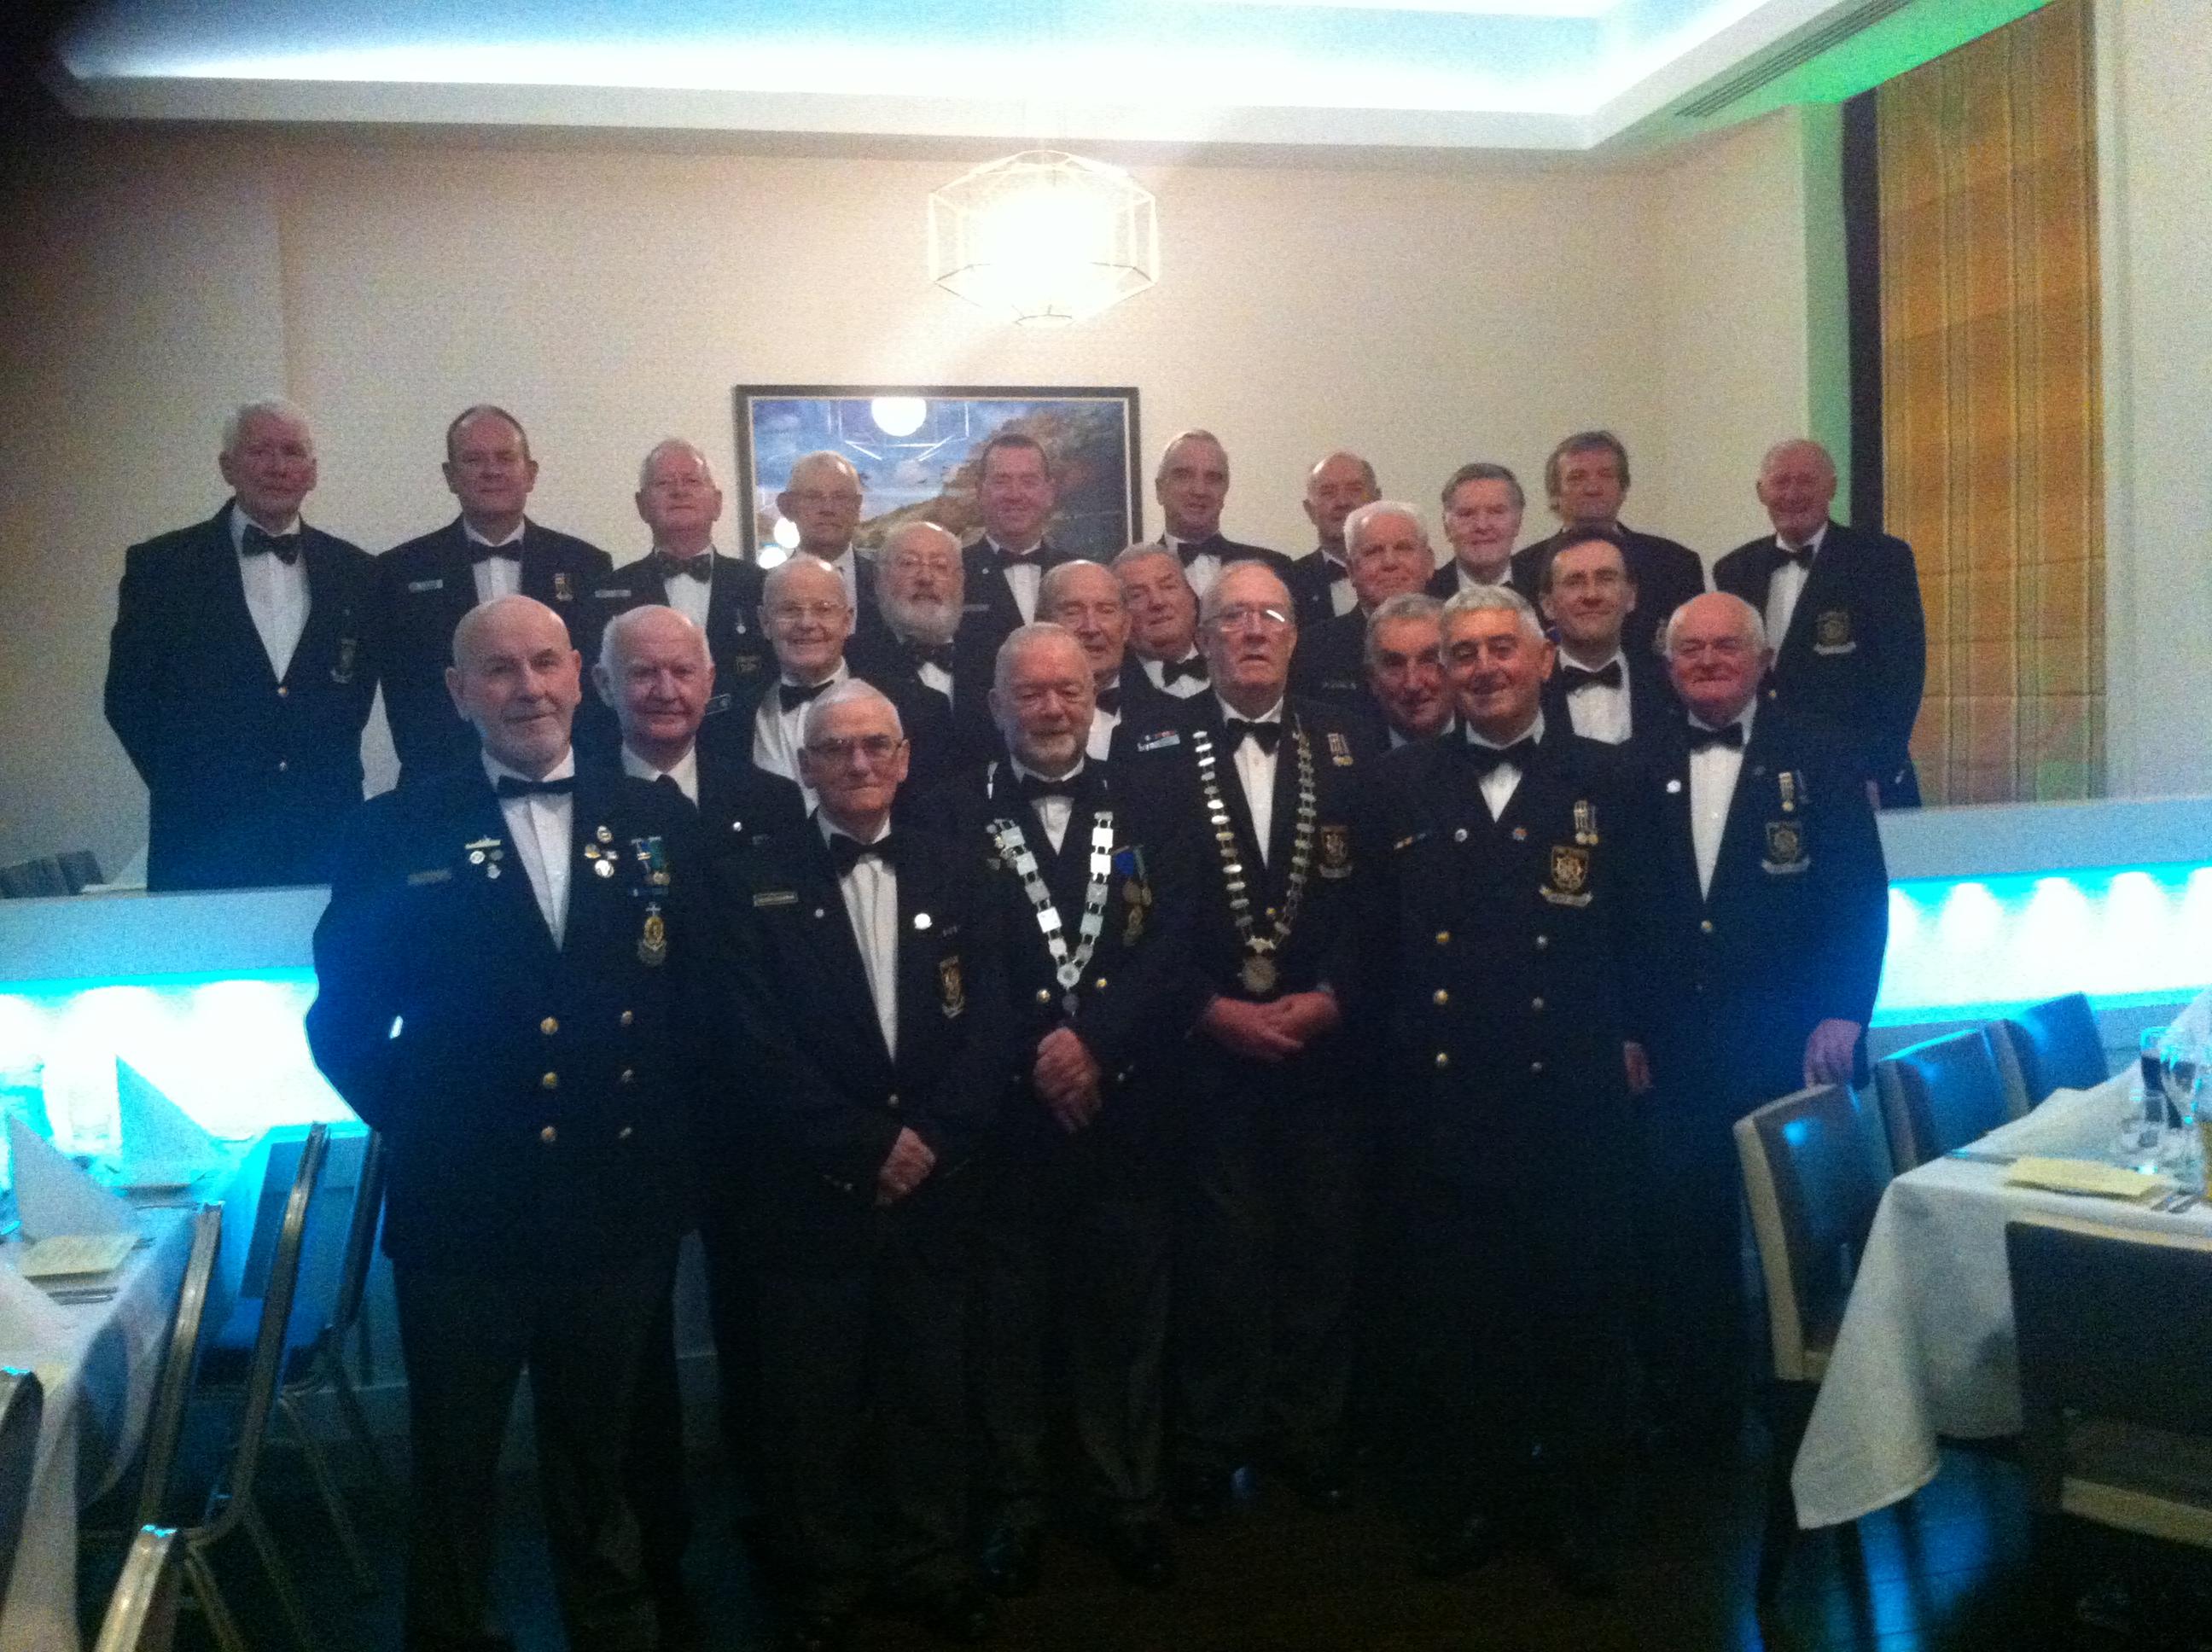 Irish Naval Association Annual Gala Dinner Fitzwilton Hotel Waterford November 2016